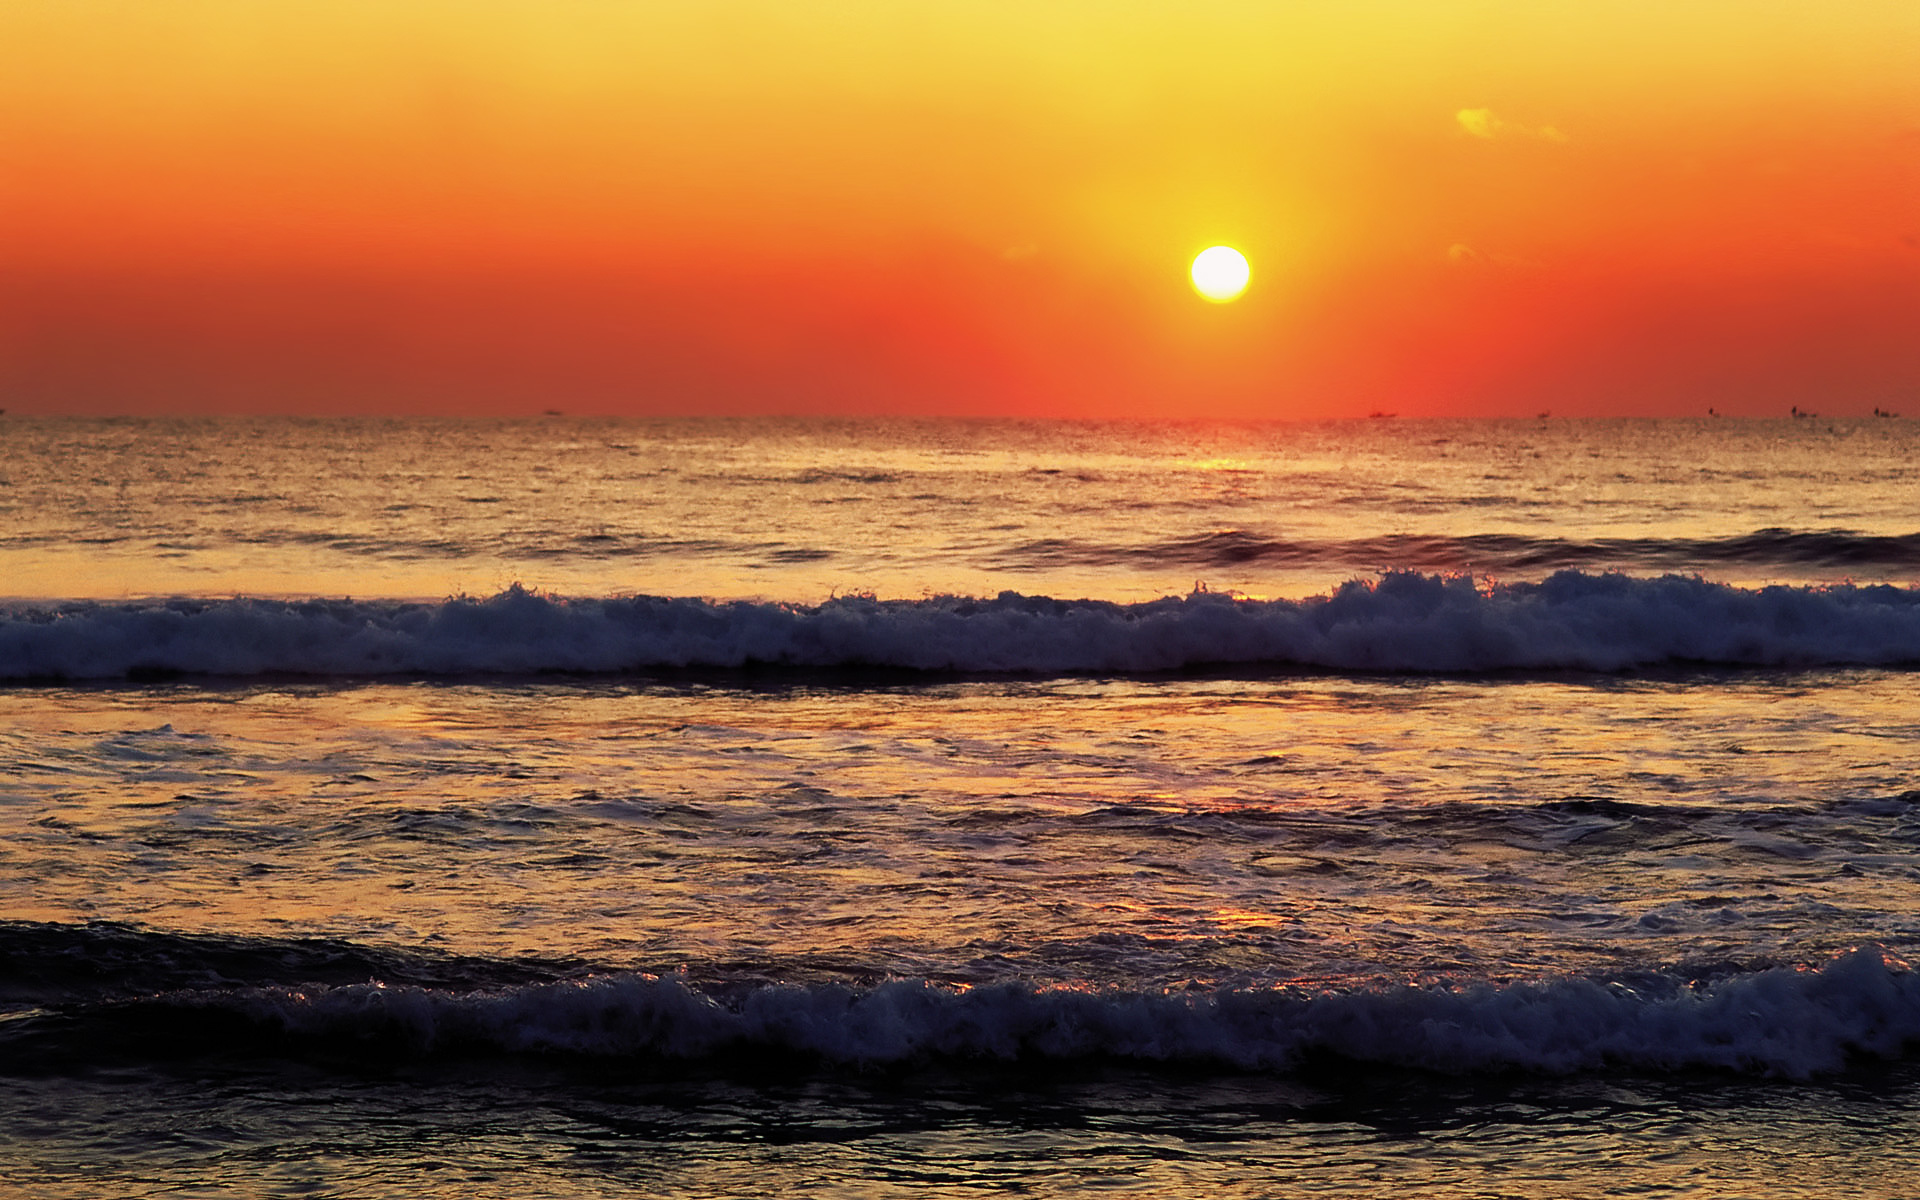 The Fading Sunlight On Sunset Wallpaper